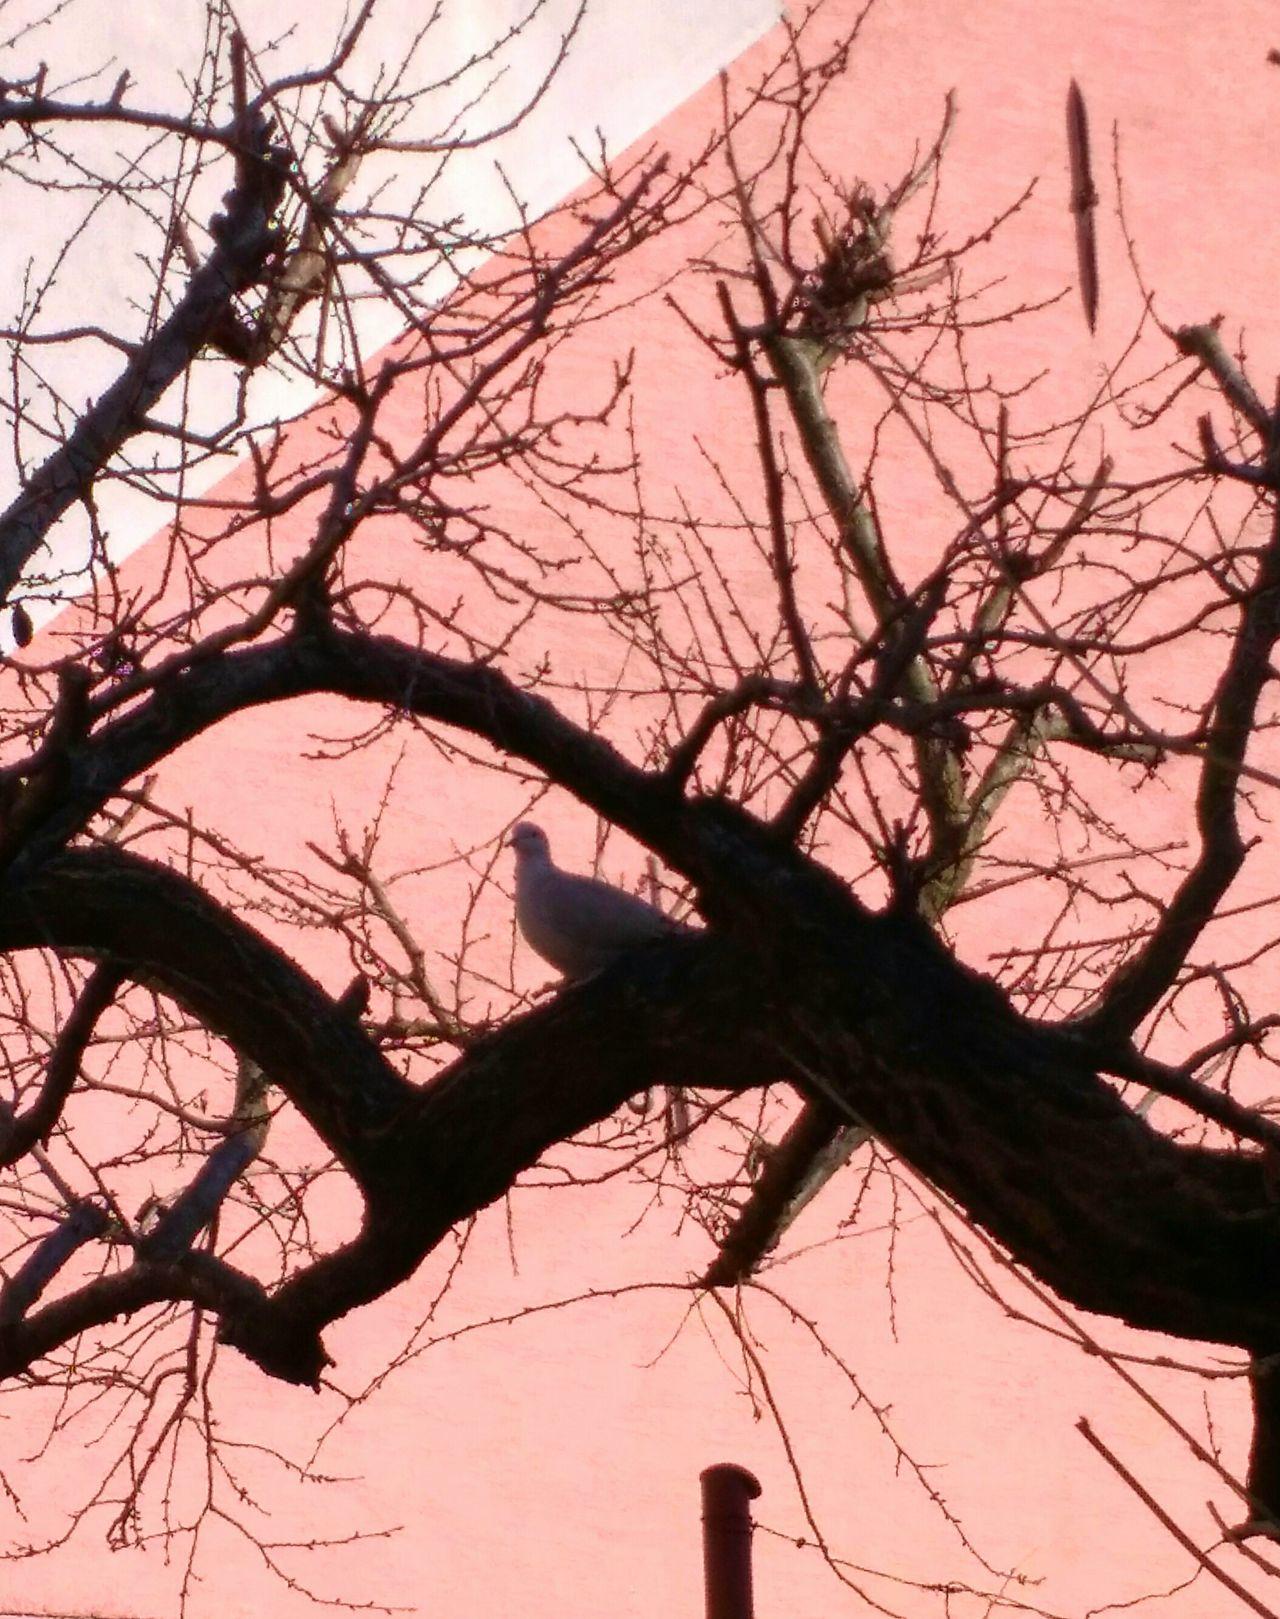 Tree Silhouette Pigeon Bird  Pigeon Trees Tree Trunk Pink Color Pink Pink House Bird Bird Photography Birds_collection Birds Of EyeEm  Pigeonslife Millennial Pink